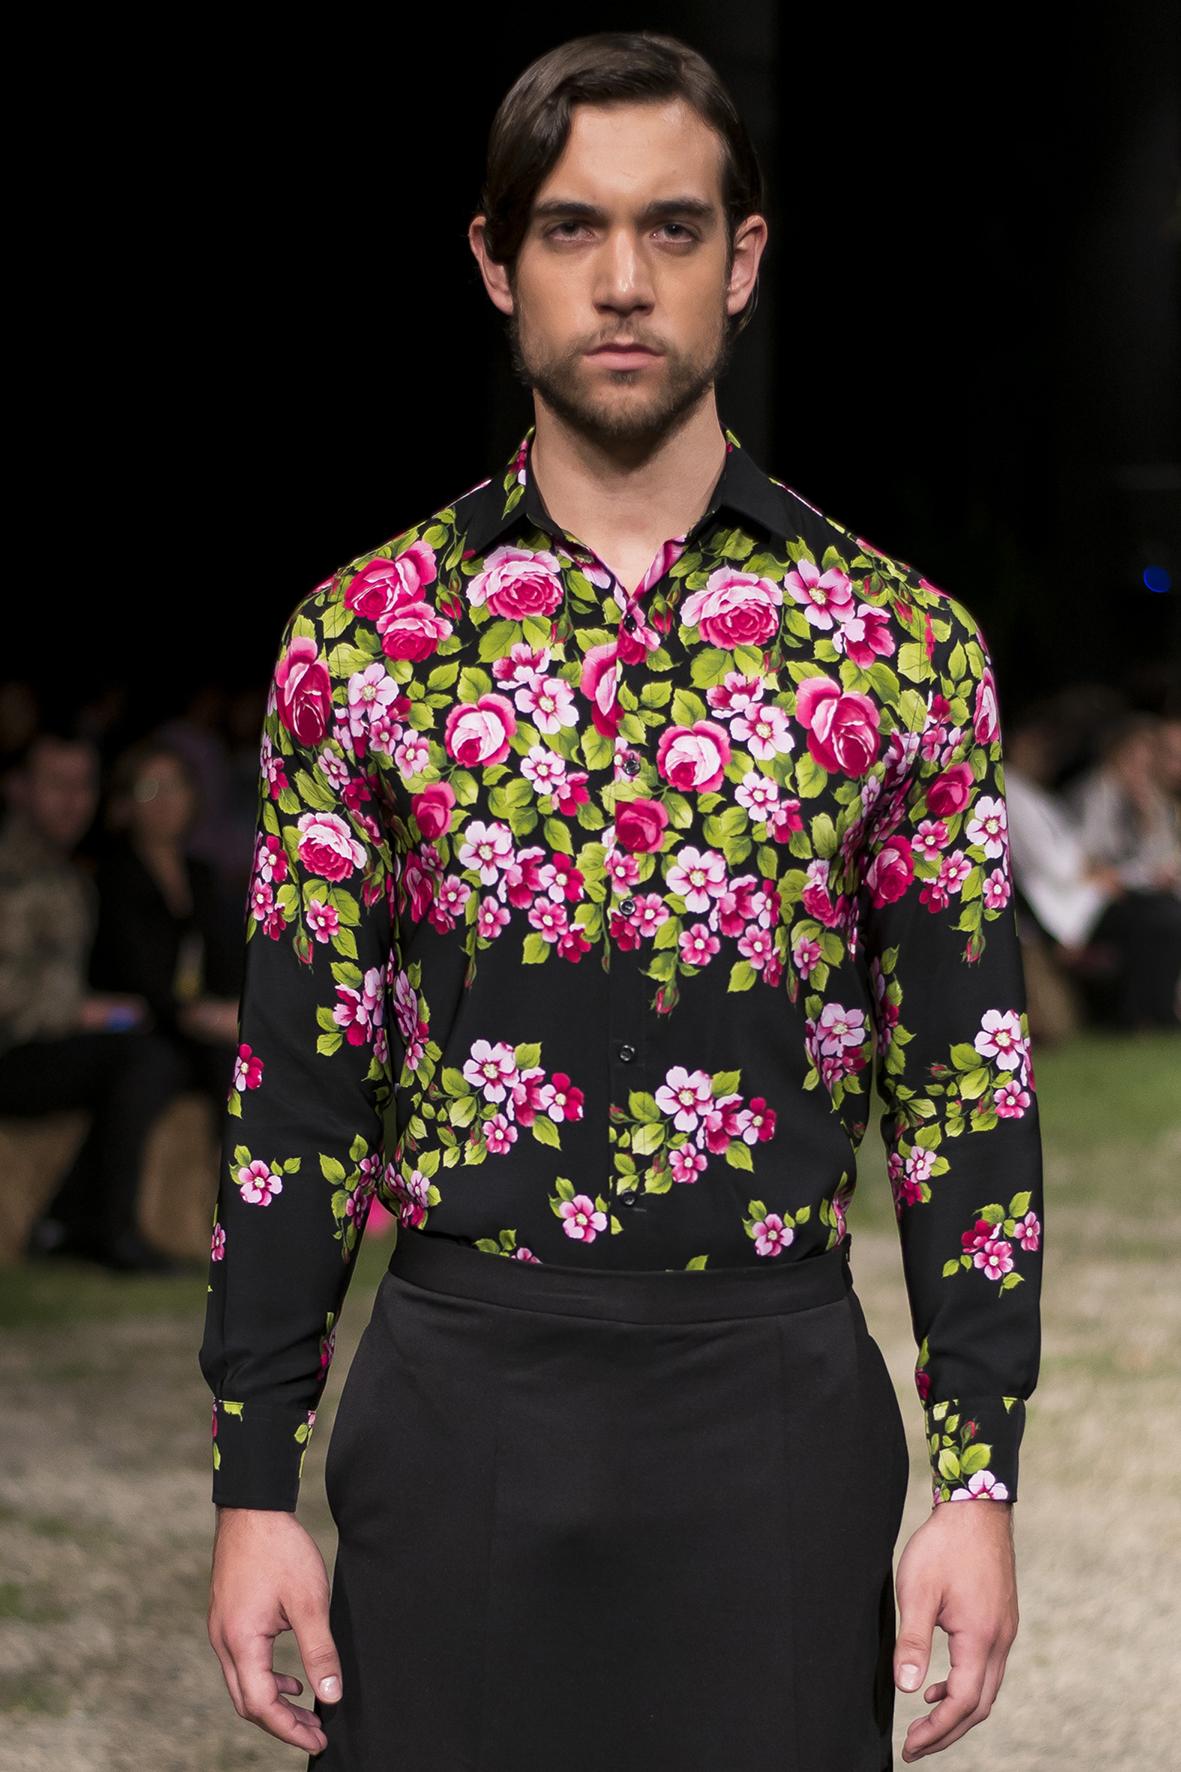 It Project evolet den tavara ceam enrique canales delrieu carolina tola eriko peru fashion moda peruana -  10.JPG